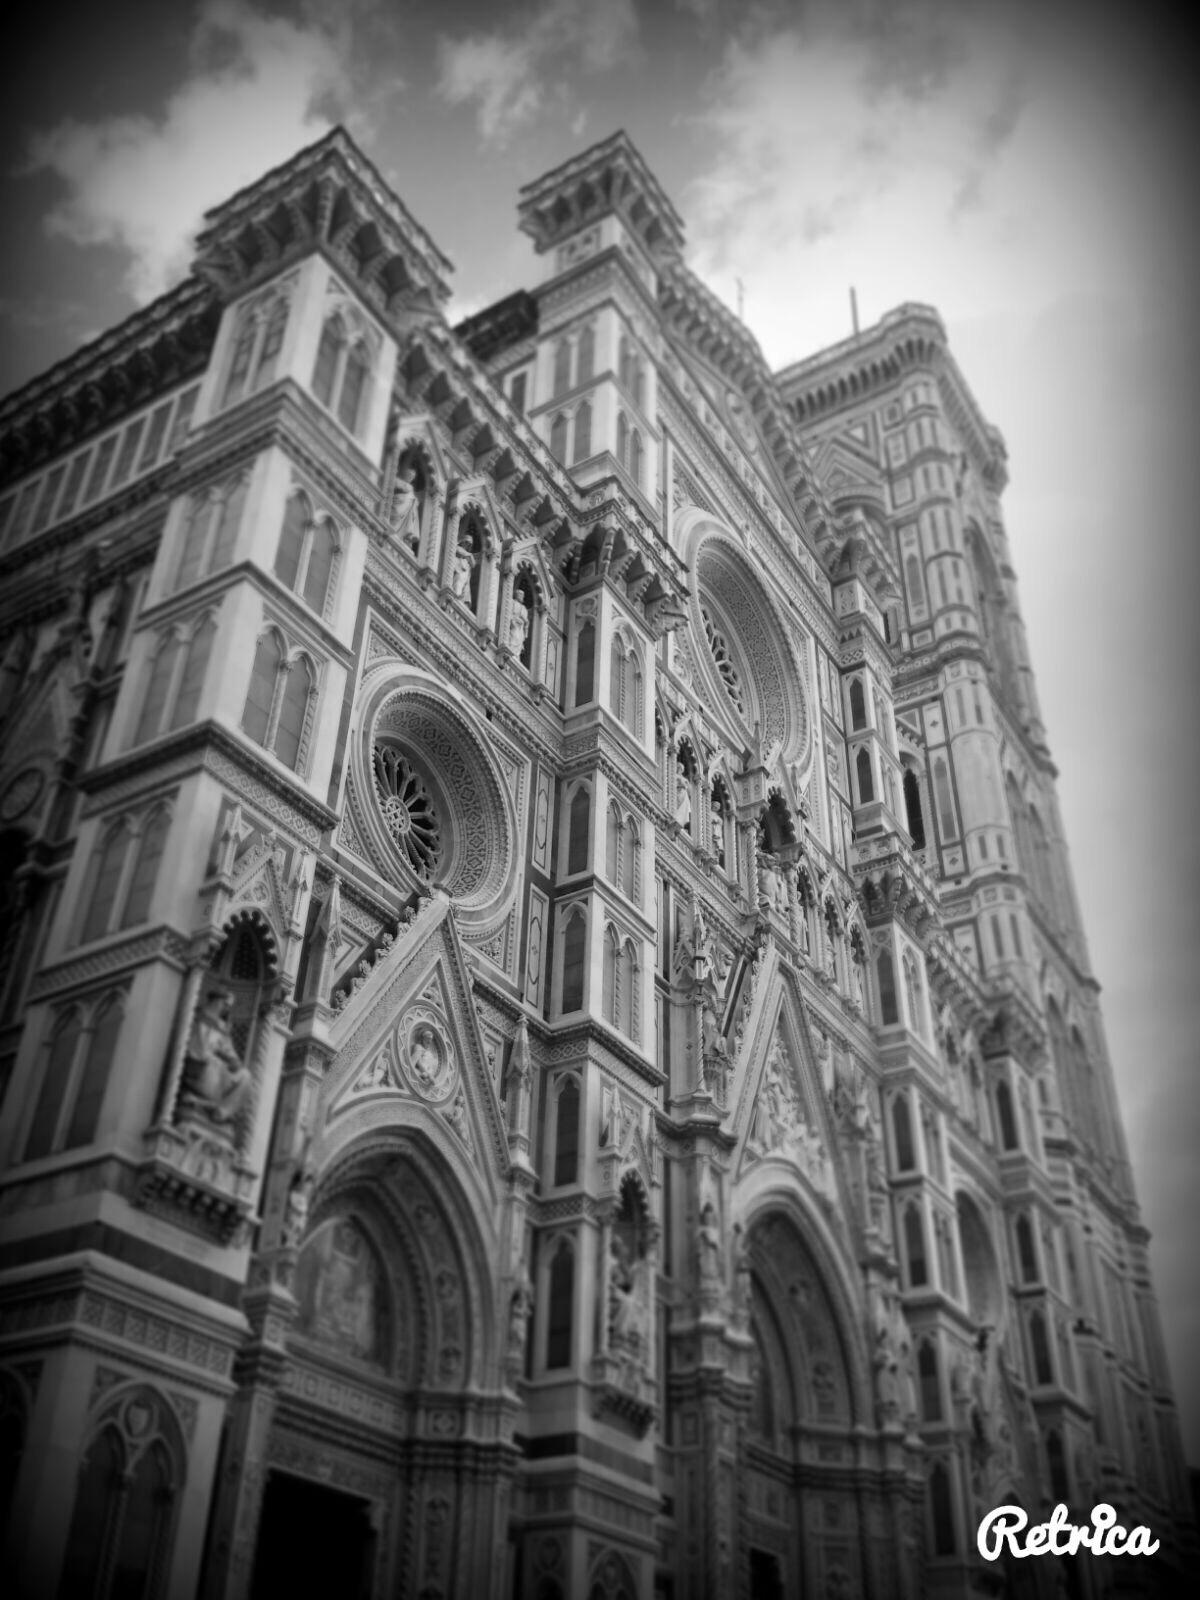 Eventi per famiglie Firenze 17 e 18 ottobre 2015